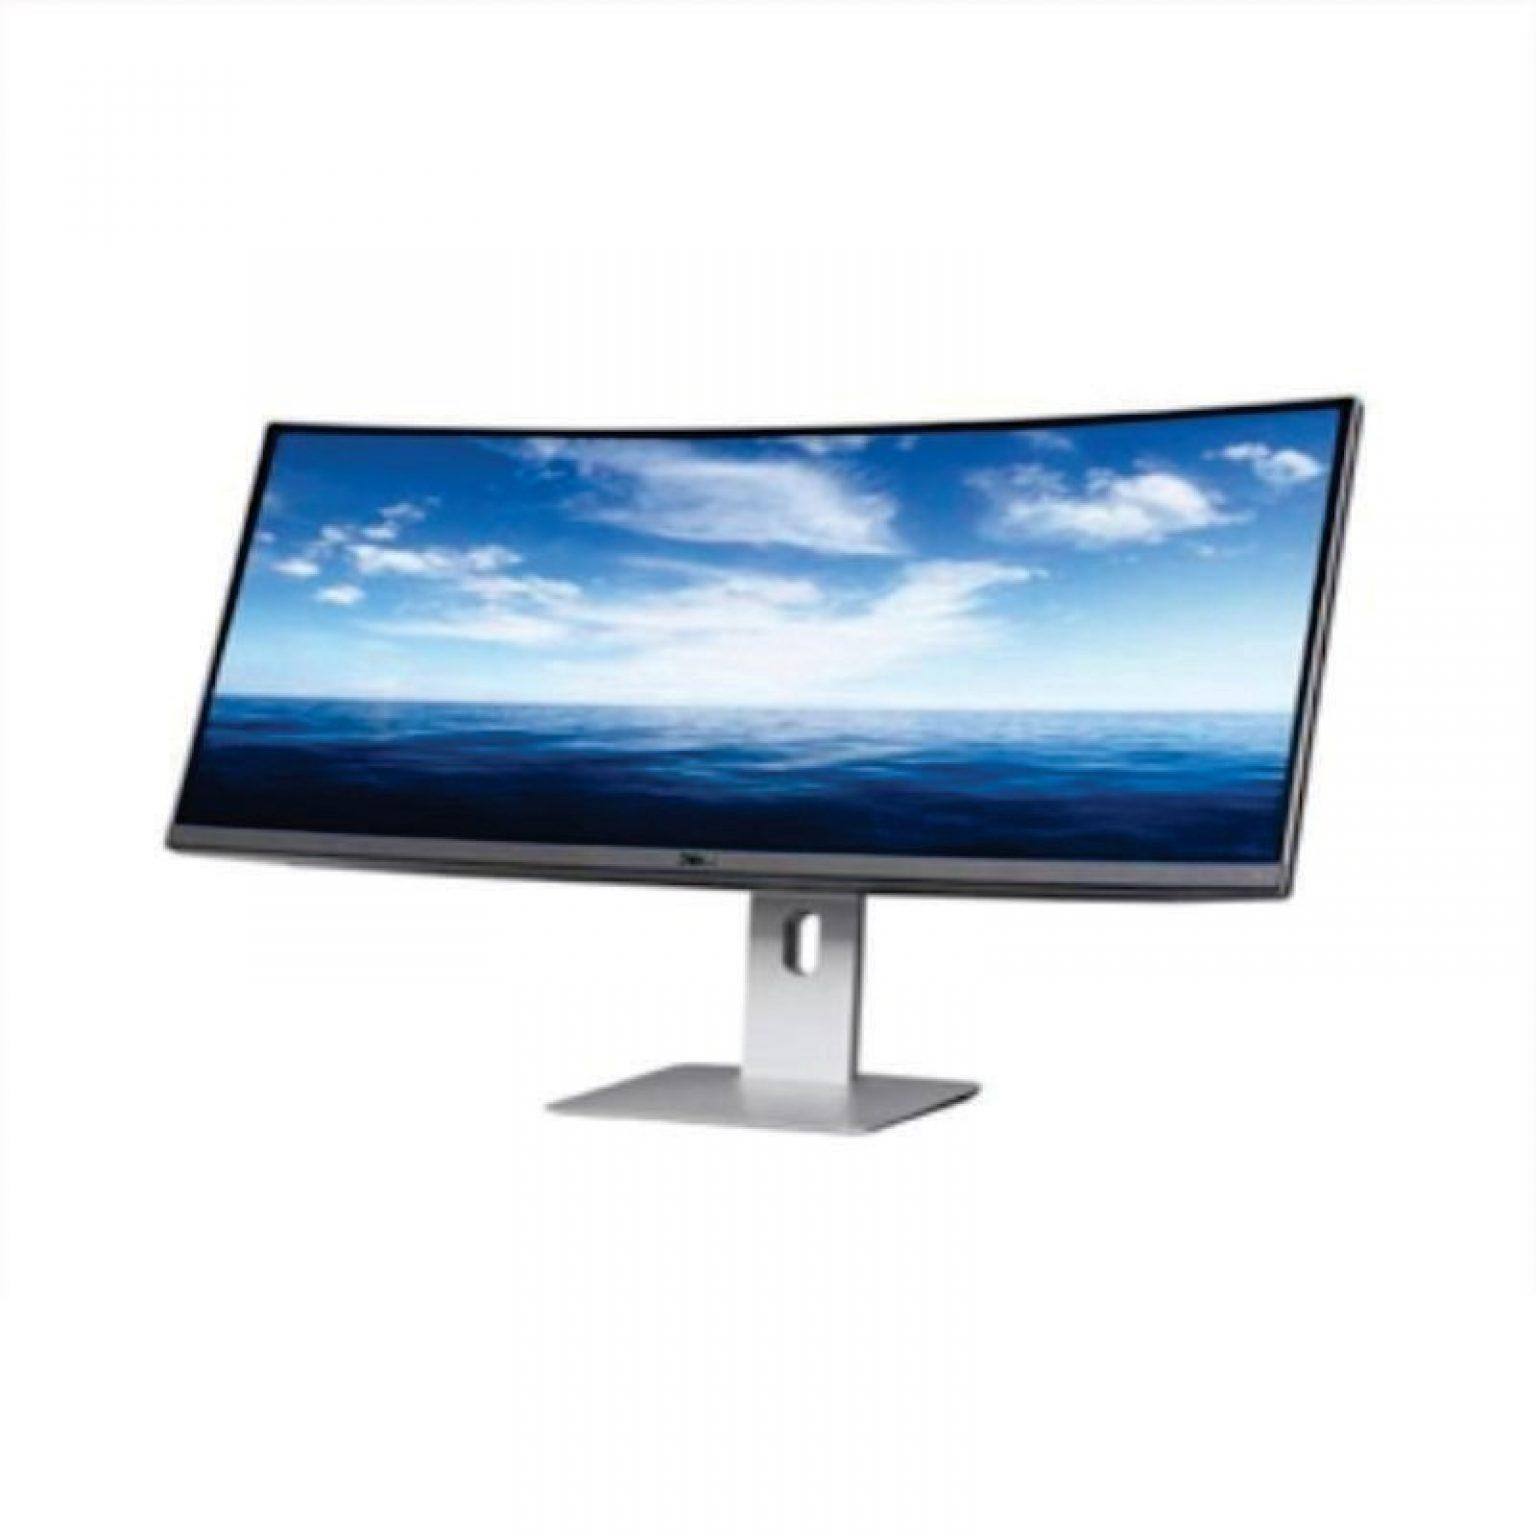 DELL - UltraSharp [U3415W] 34Inchi Curved Monitor